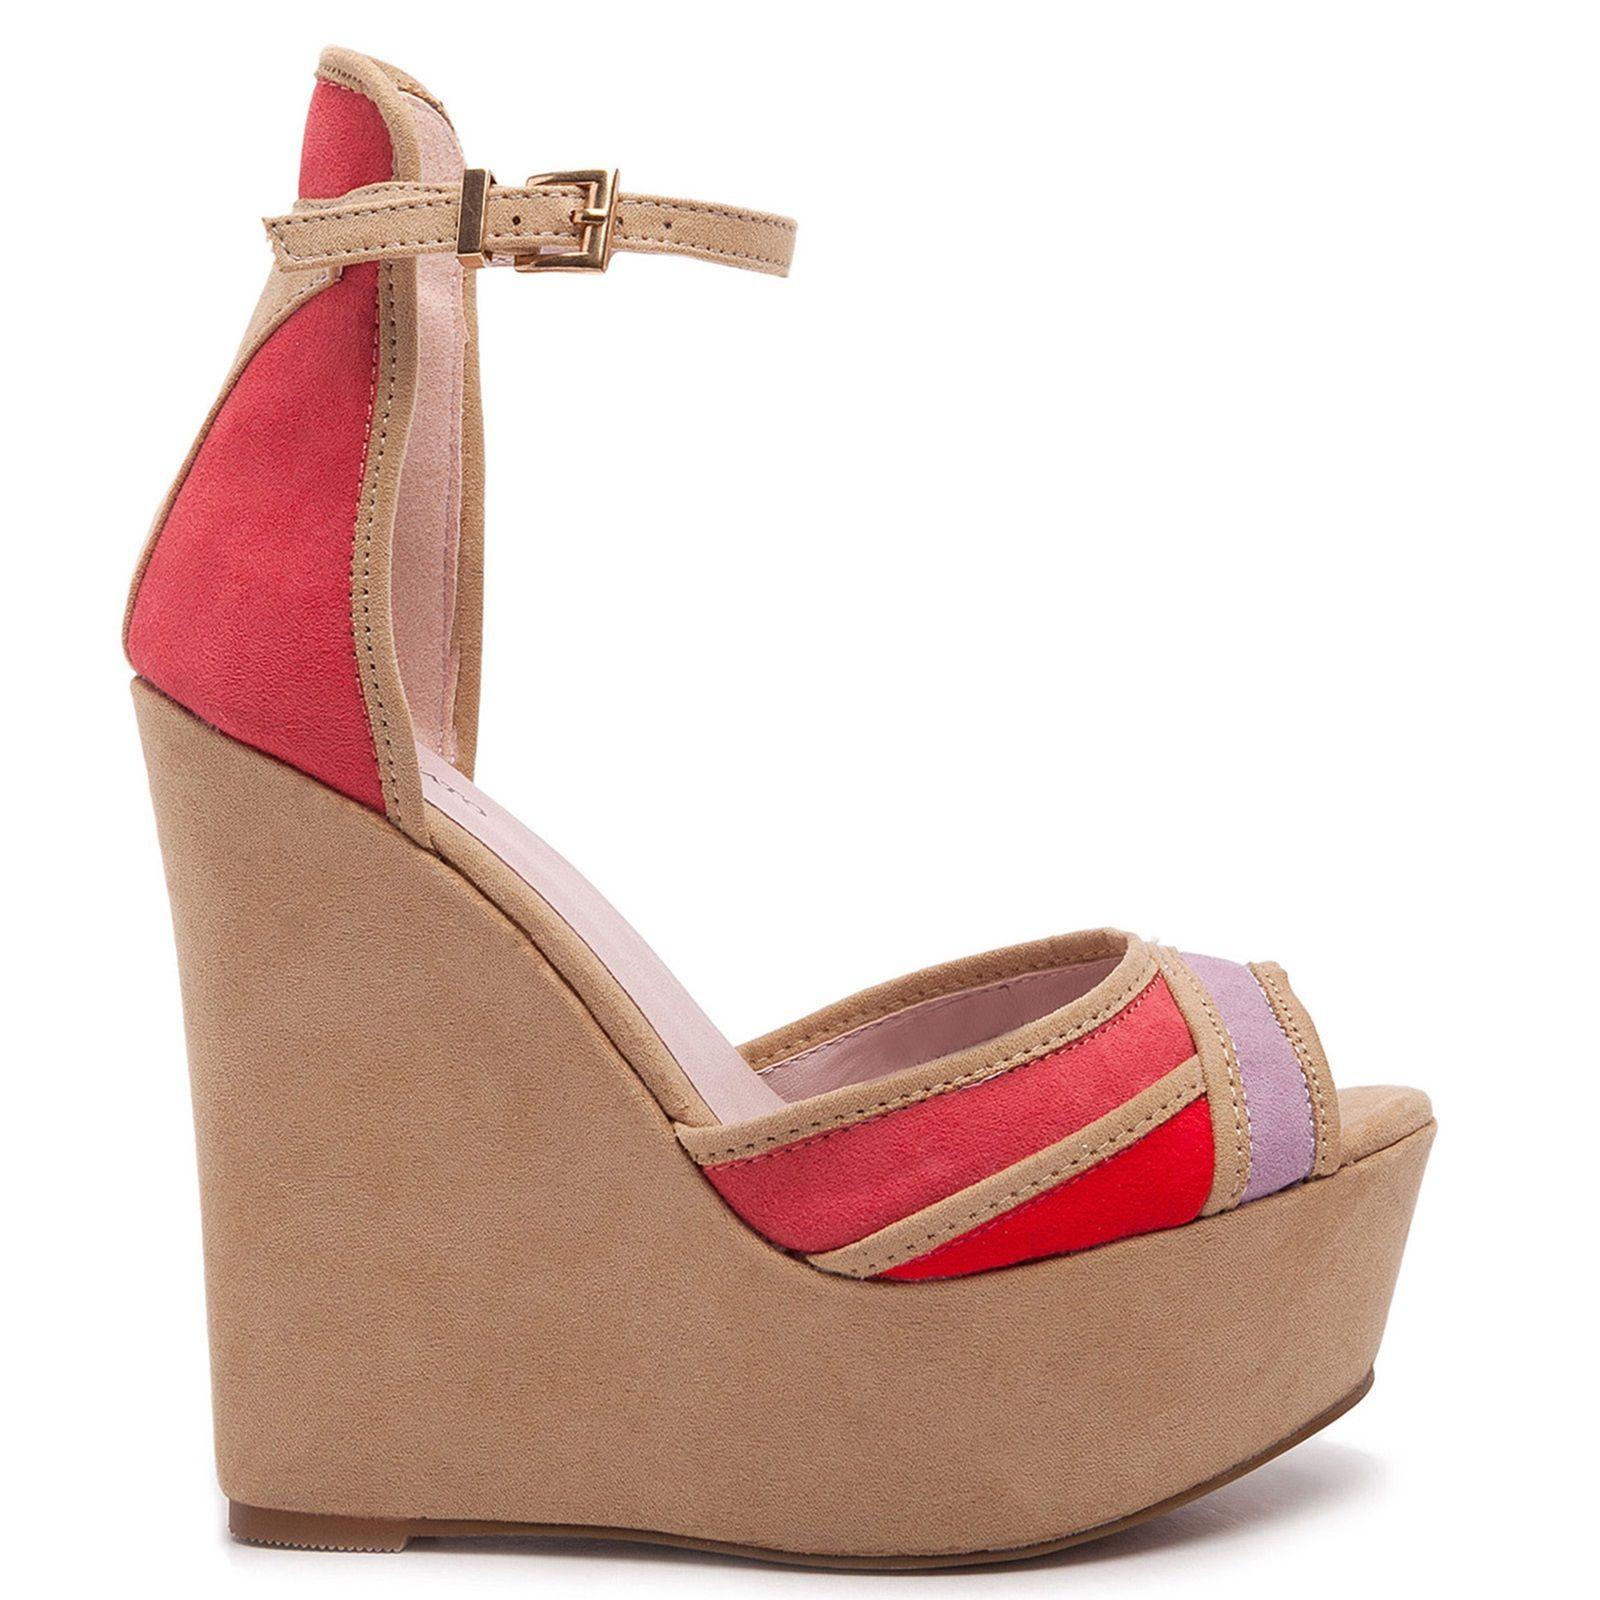 b1954aa37e8 Beige suede high heel platform with strap